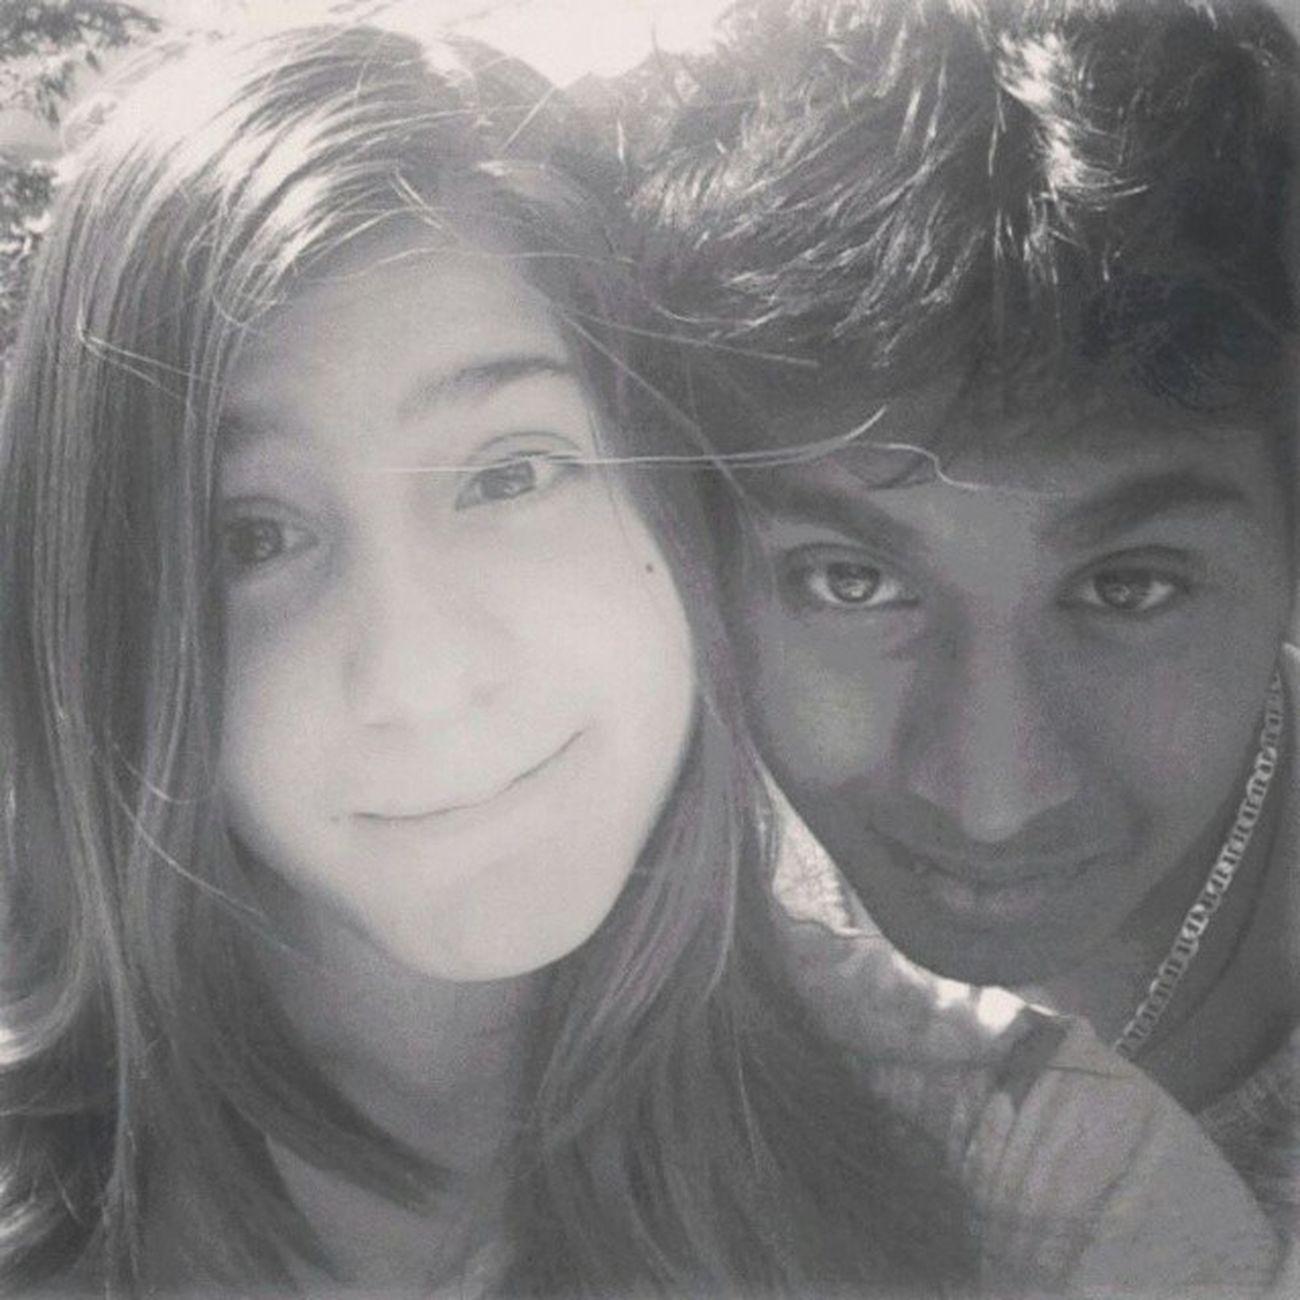 Selfieeee :D